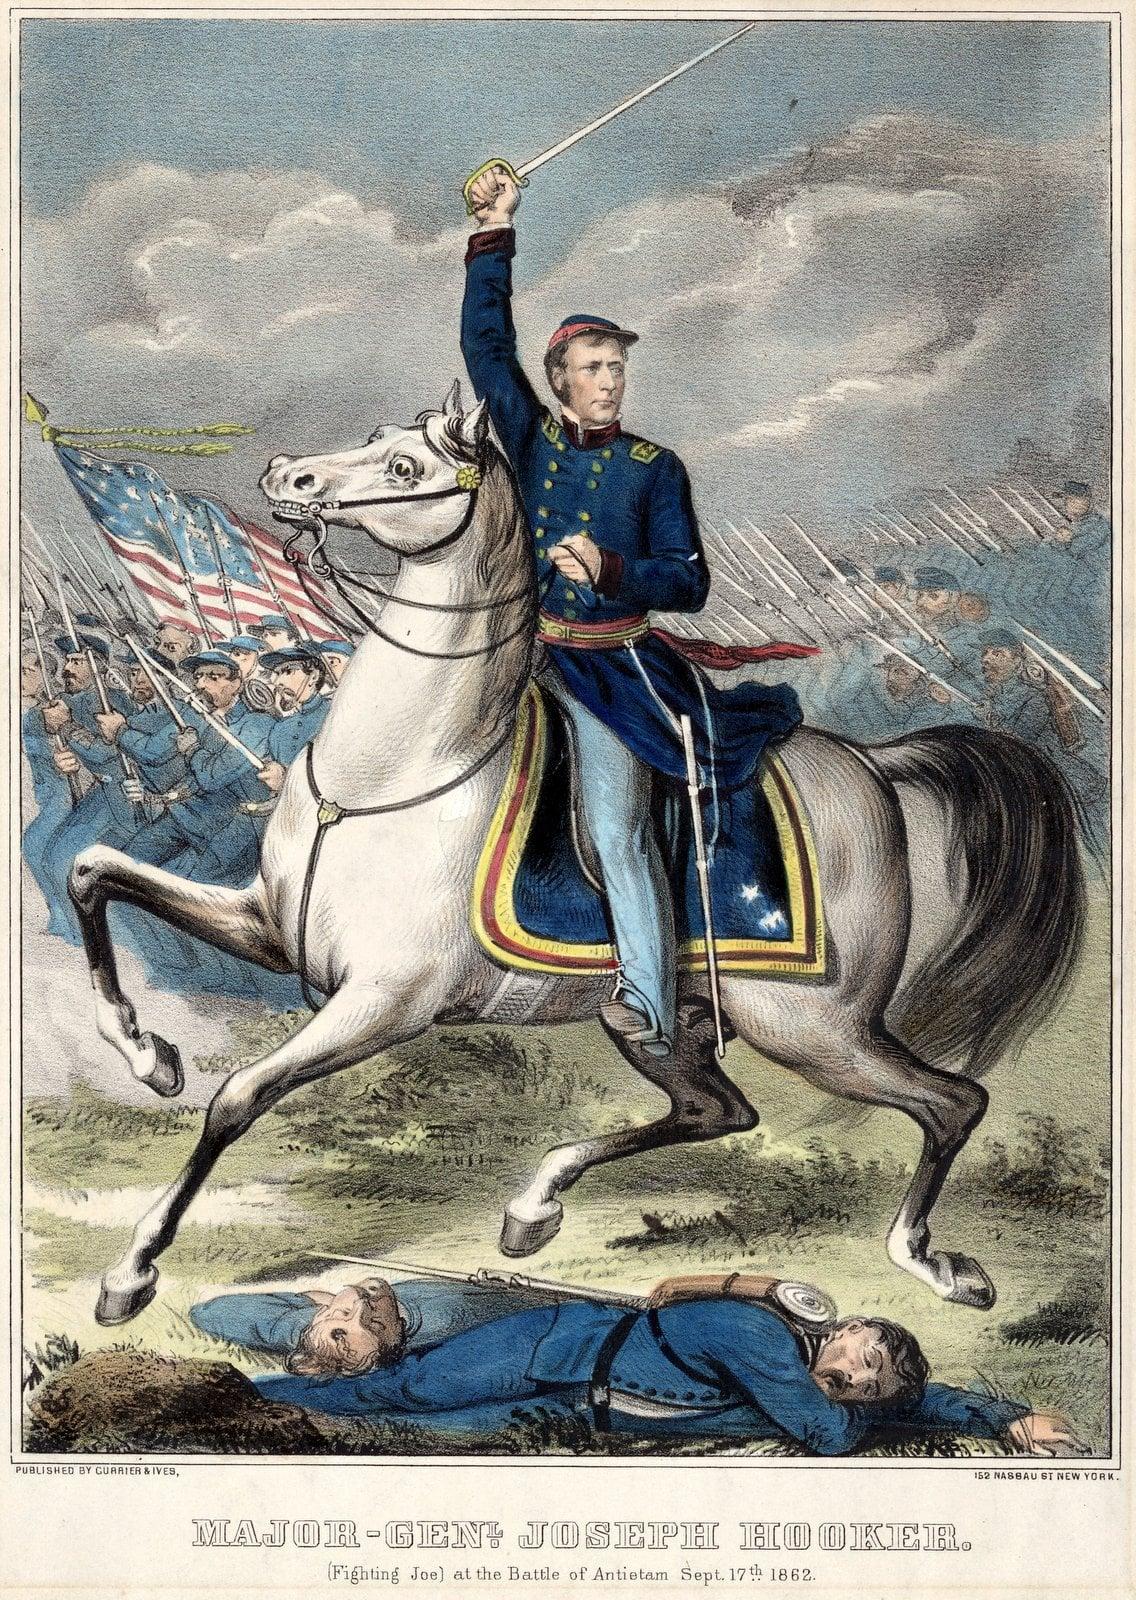 Major General Joseph Hooker (Fighting Joe) at the Battle of Antietam September 17 186.